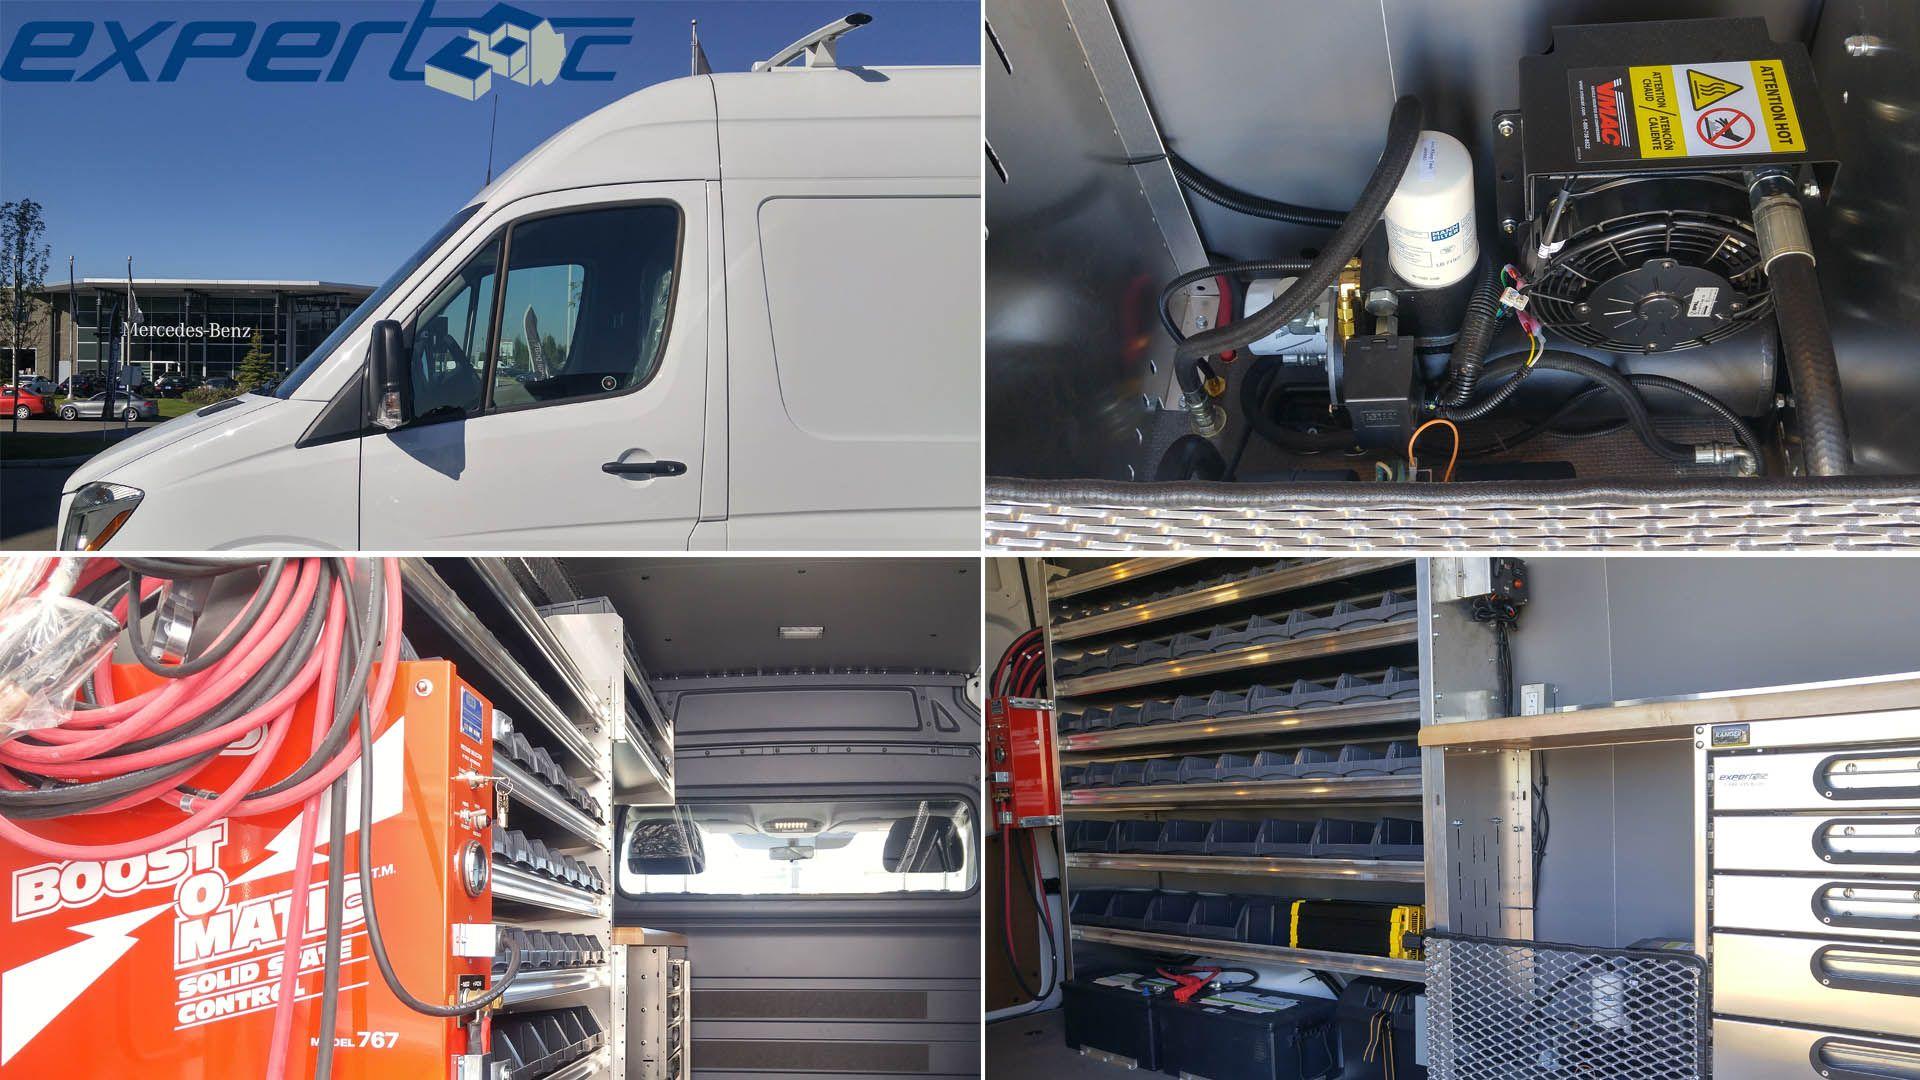 We outfitted this MercedesBenz Edmonton West Sprinter Van